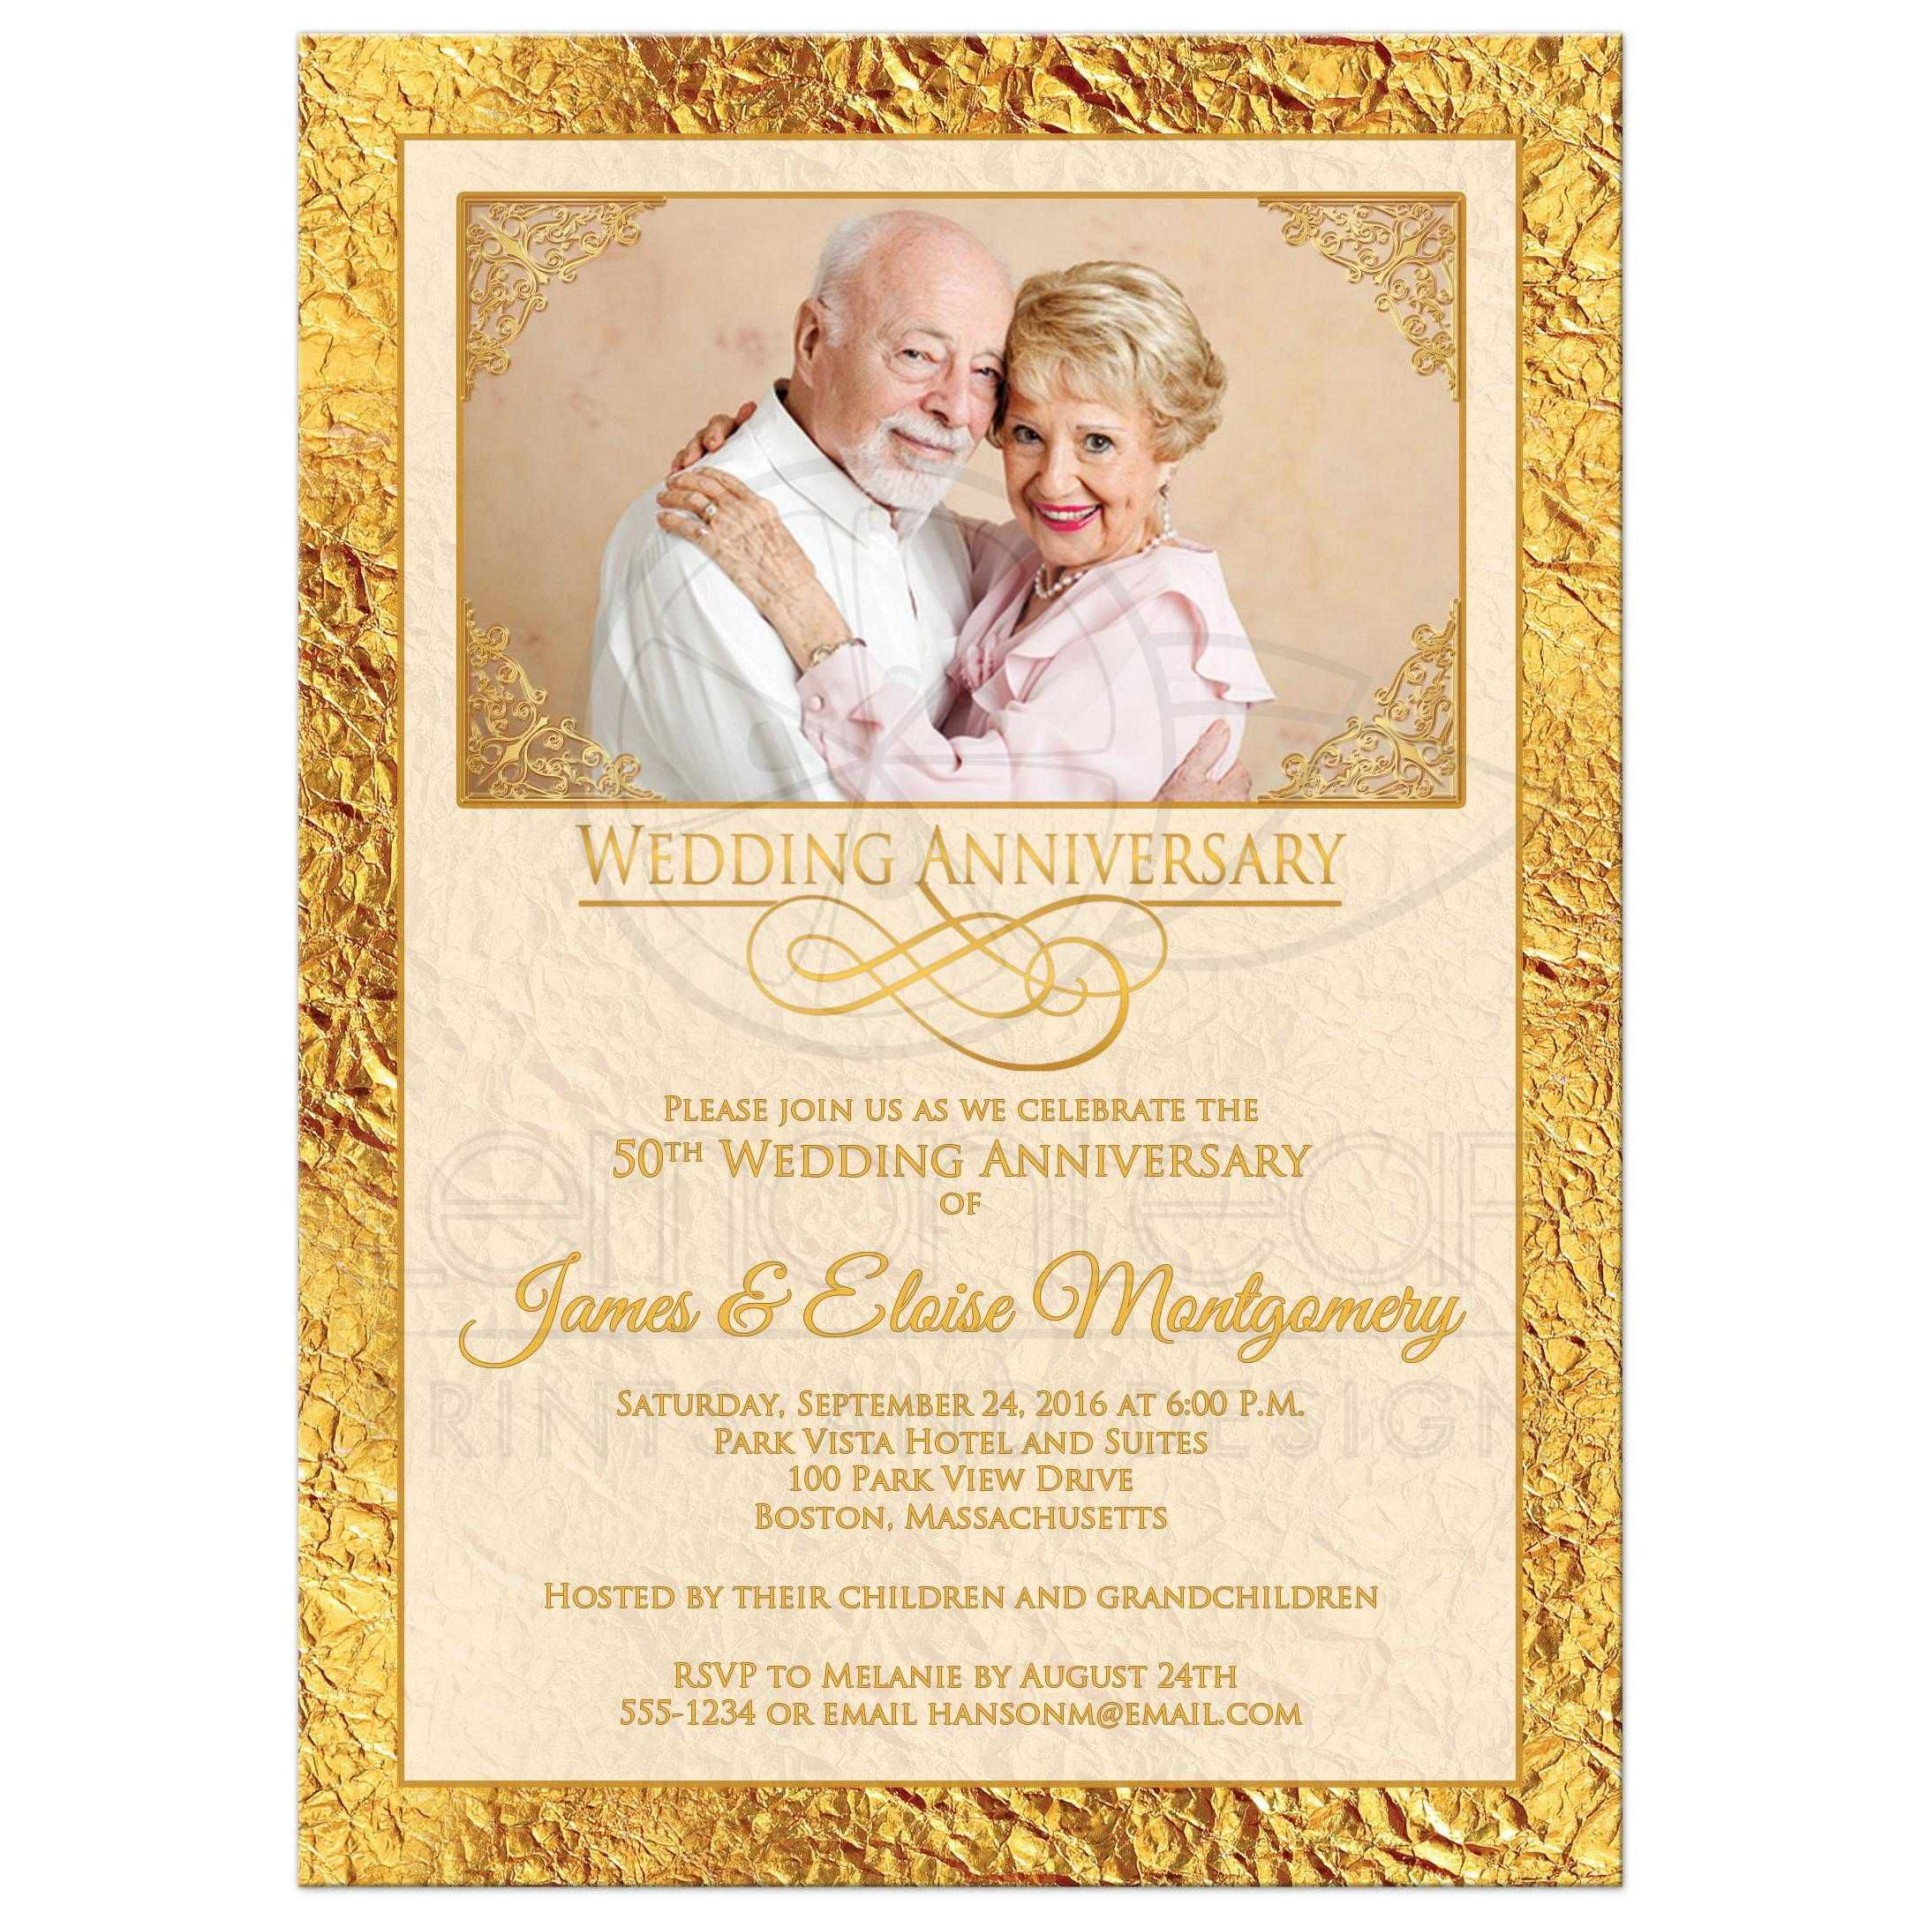 005 Stirring 50th Wedding Anniversary Invitation Card Template Highest Quality  Templates Sample1920